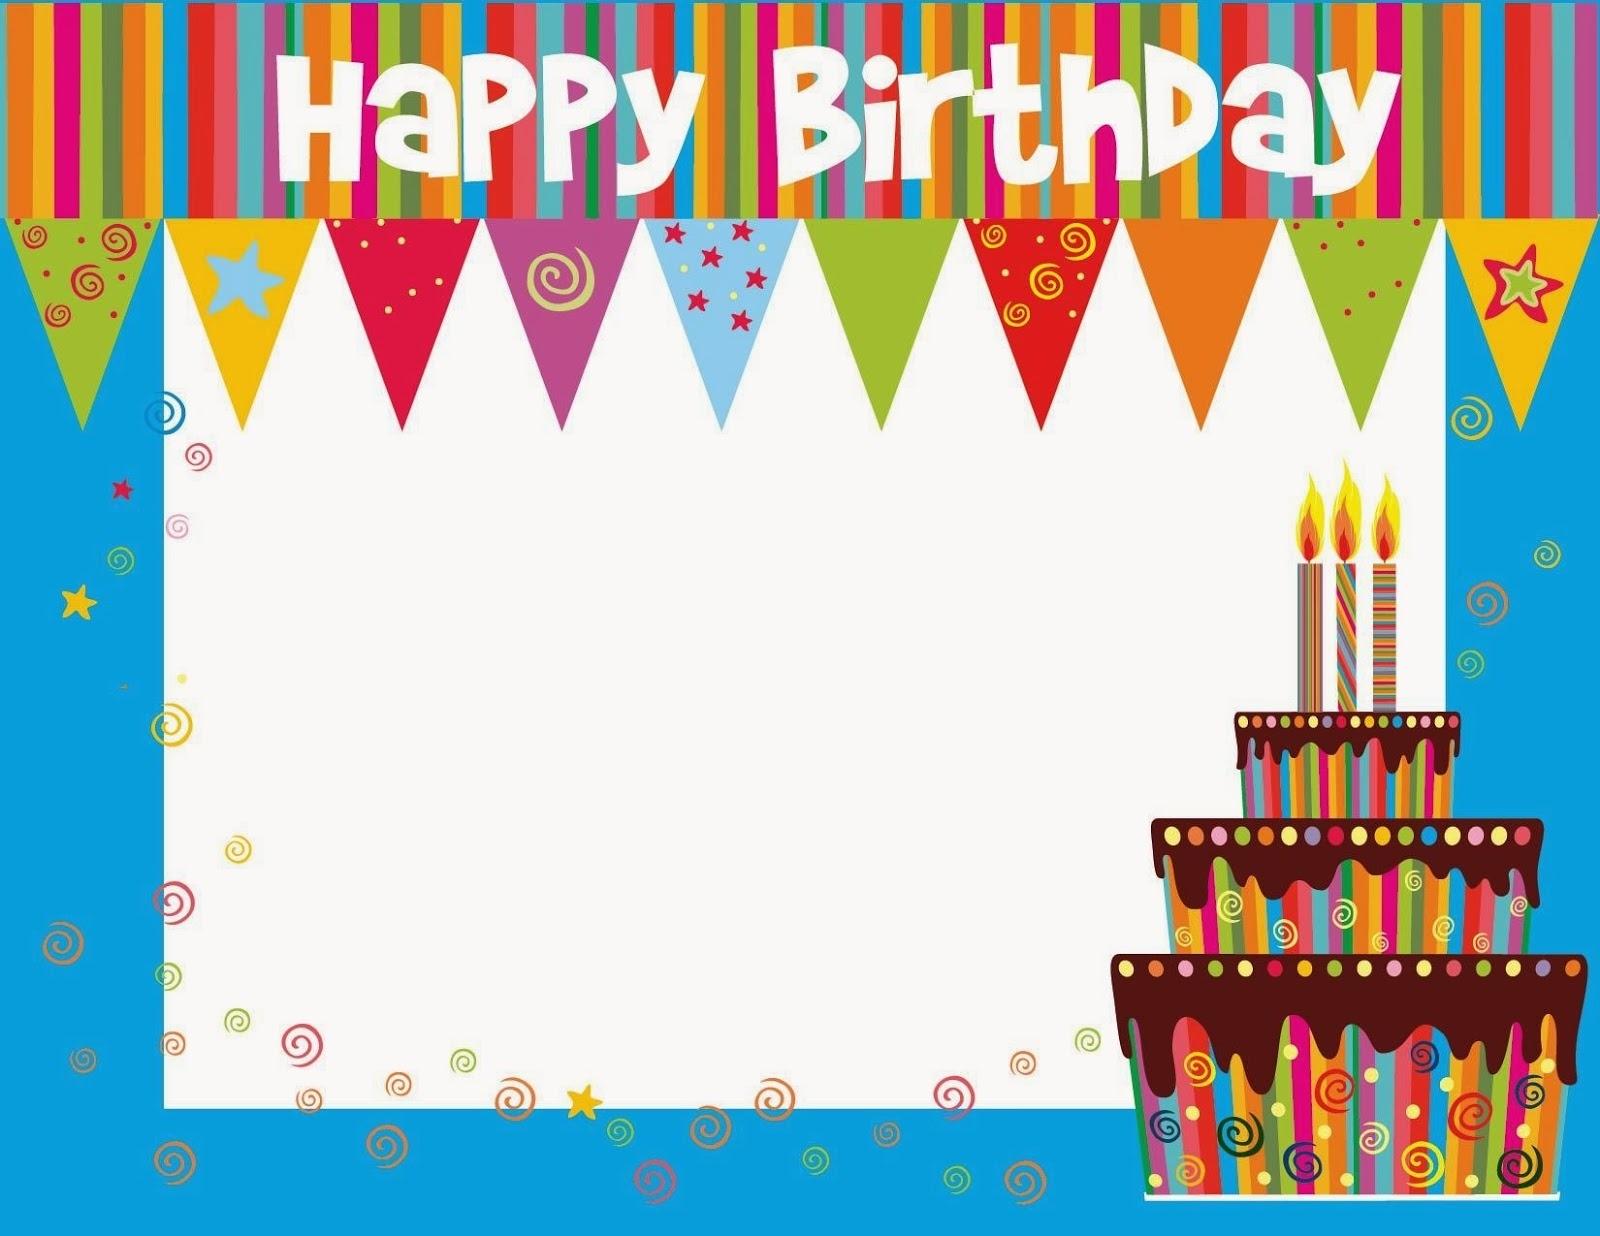 Happy Birthday Cards Online Free Printable – Happy Holidays! Inside - Free Printable Happy Birthday Cards Online